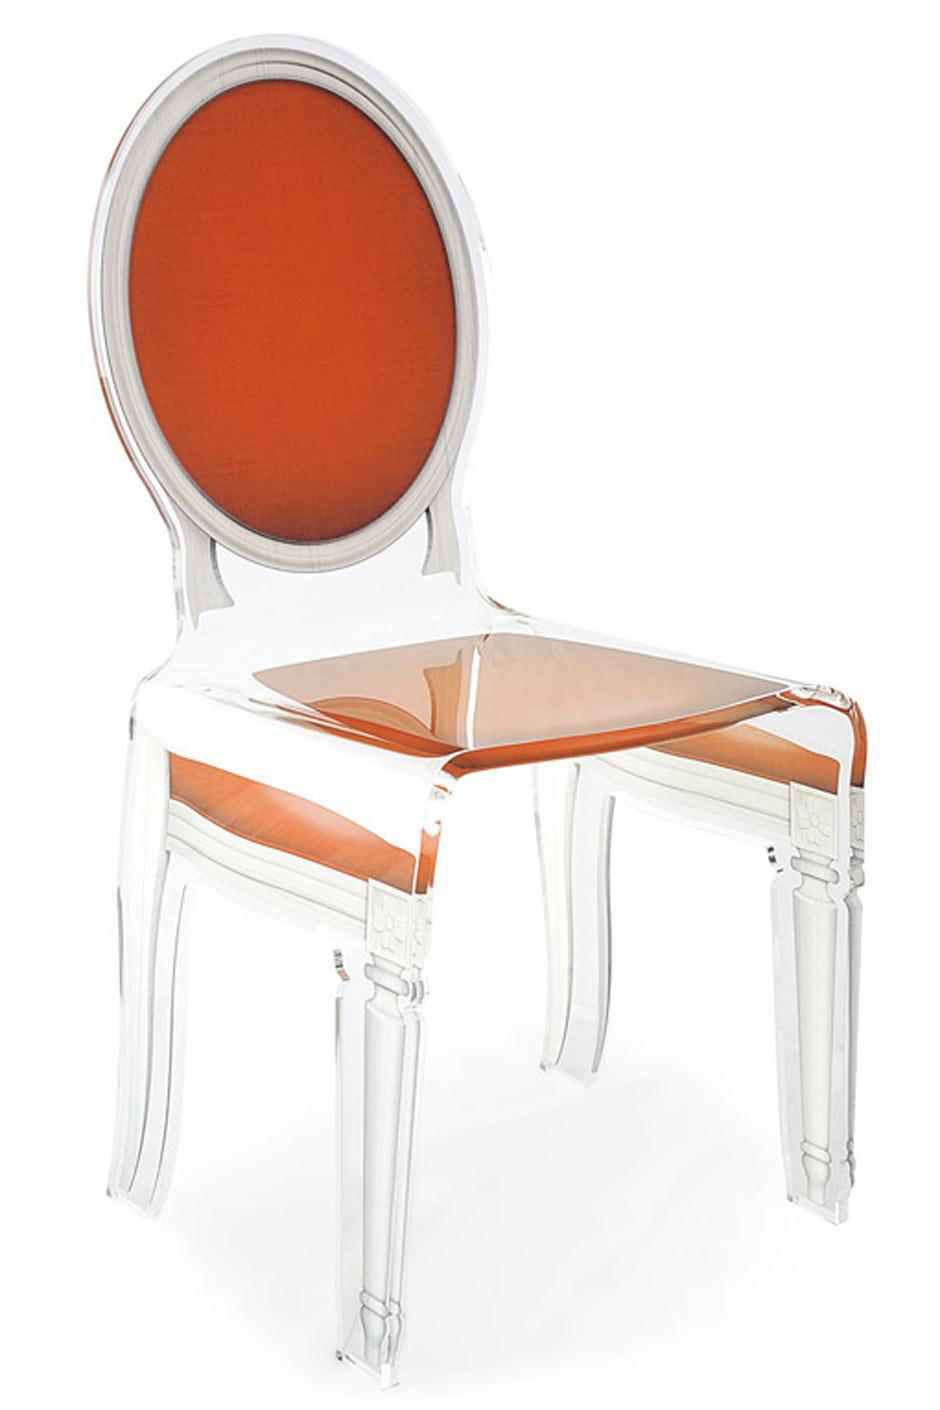 chaise m daillon baroque en plexiglas sixteen motif orange. Black Bedroom Furniture Sets. Home Design Ideas